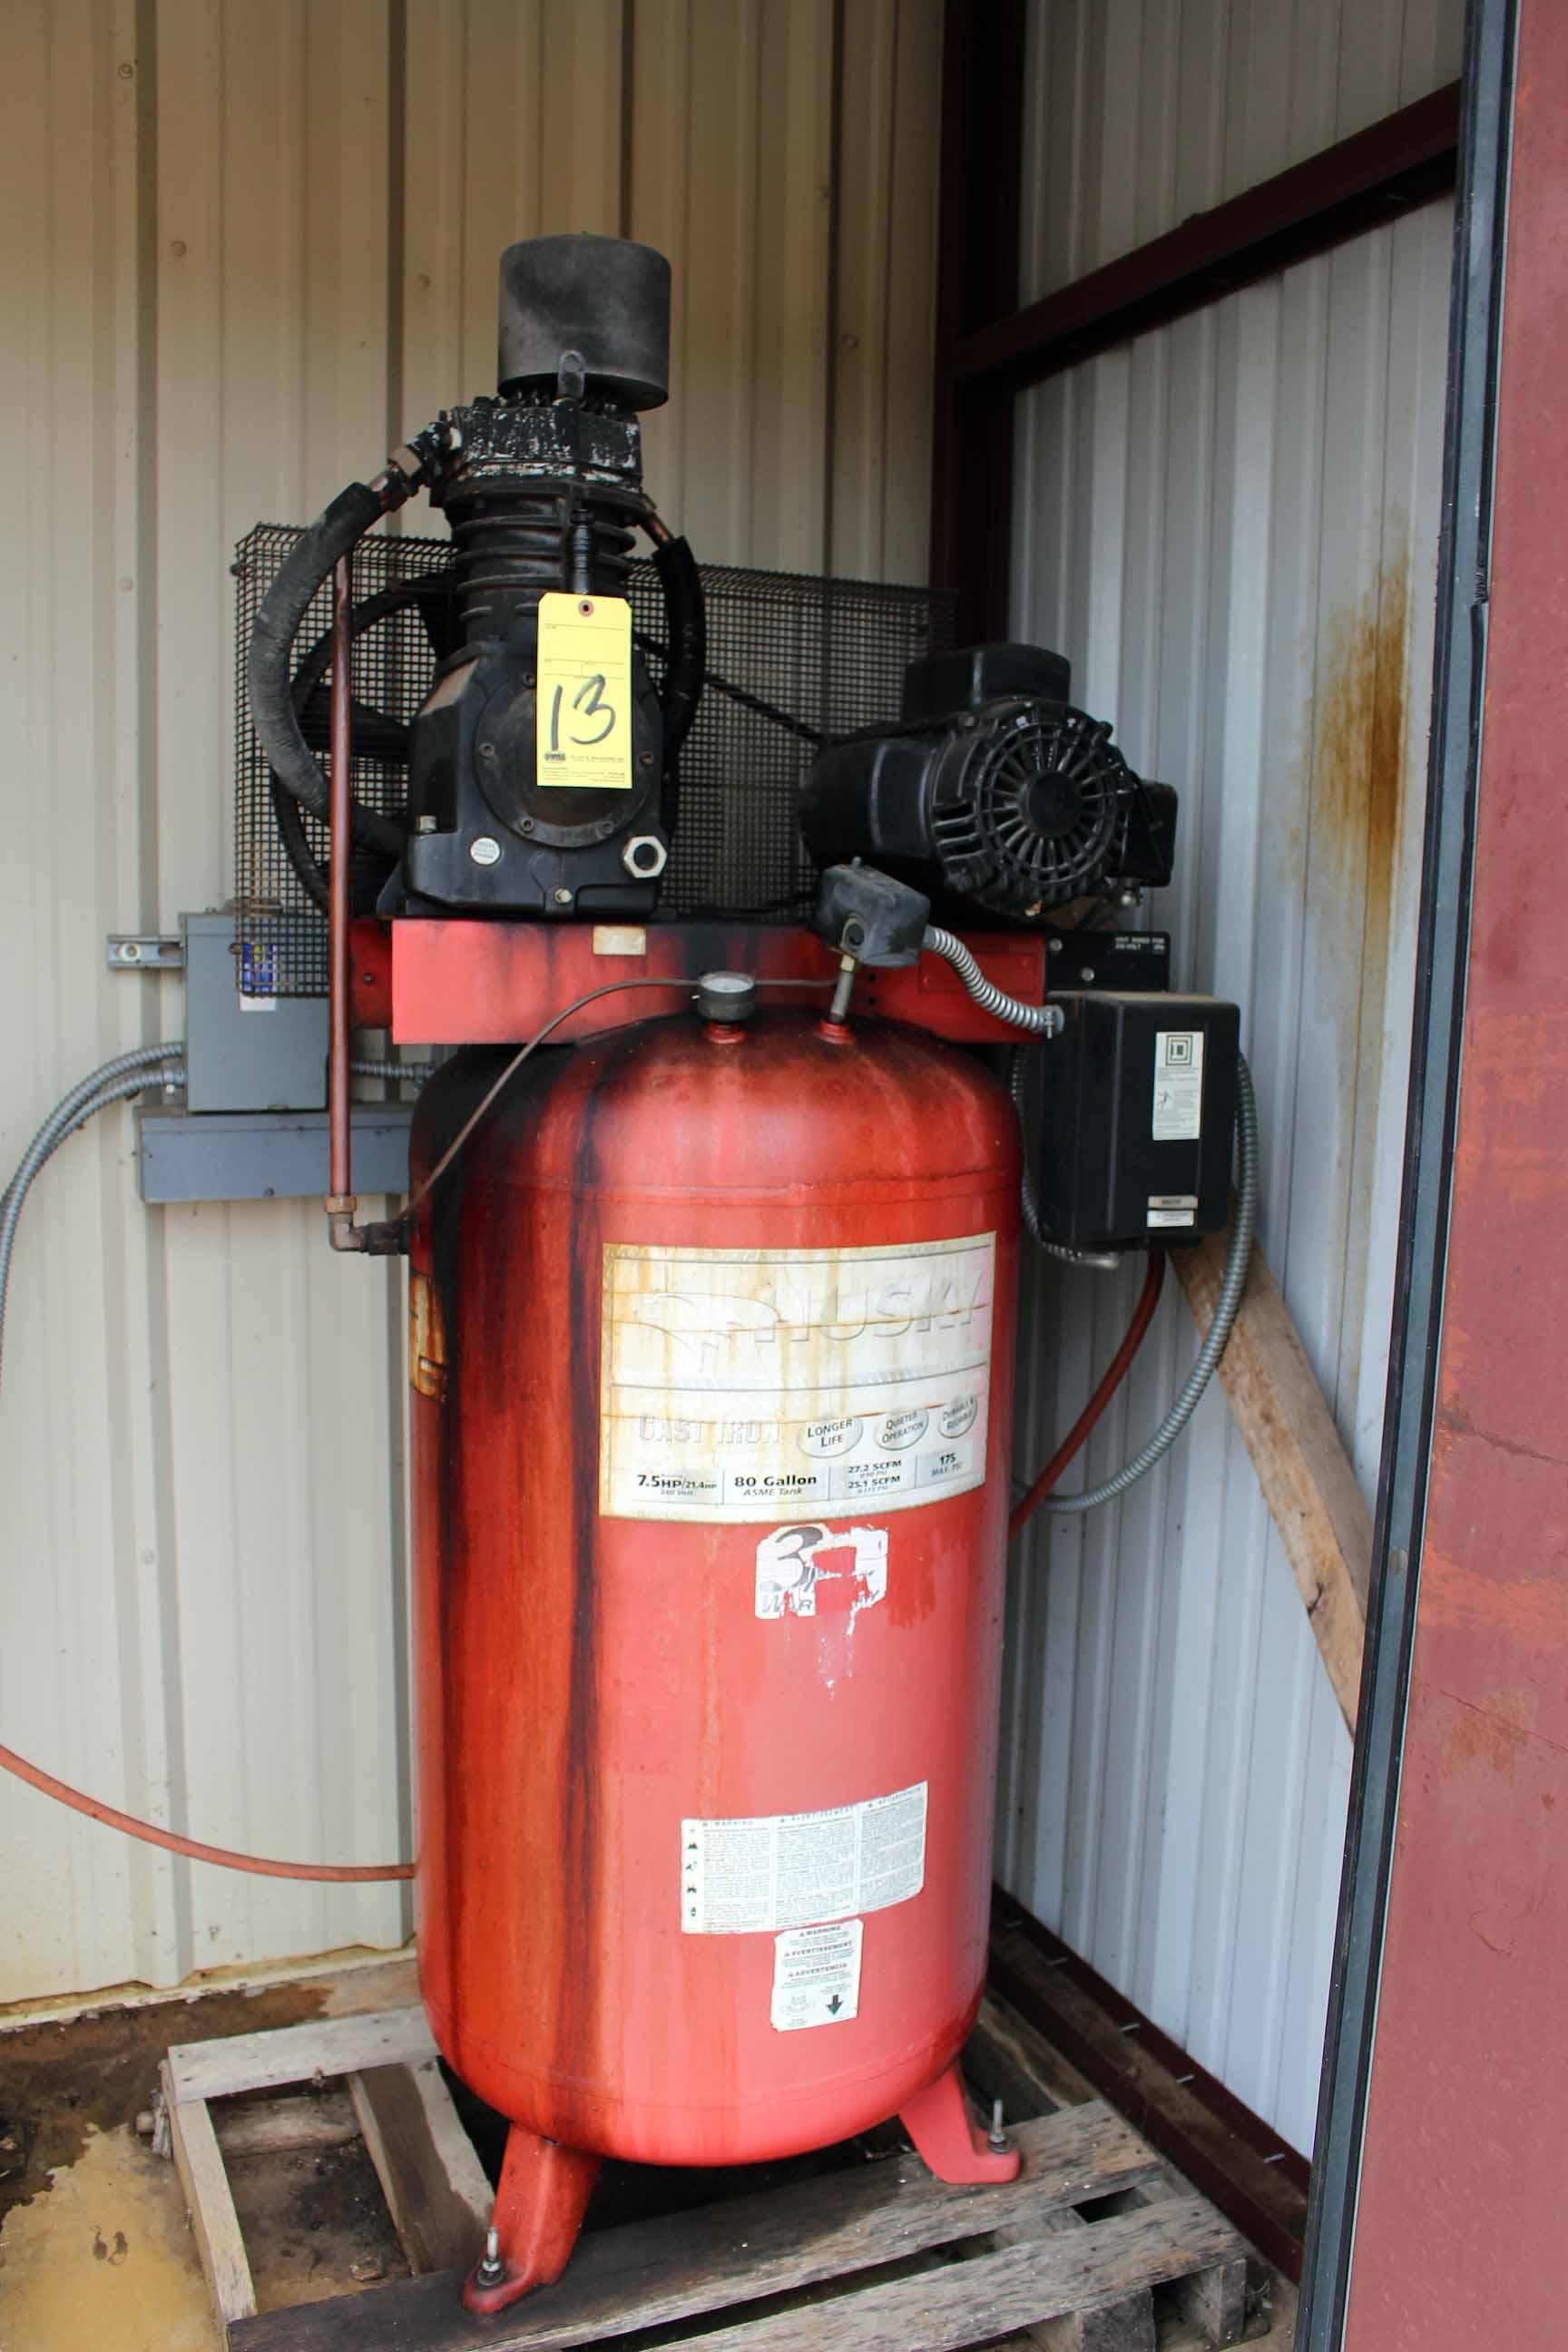 Lot 13 - AIR COMPRESSOR, HUSKY PRO, 80 gal. tank, 7-1/2 HP motor, 175 max. PSI (Location A)